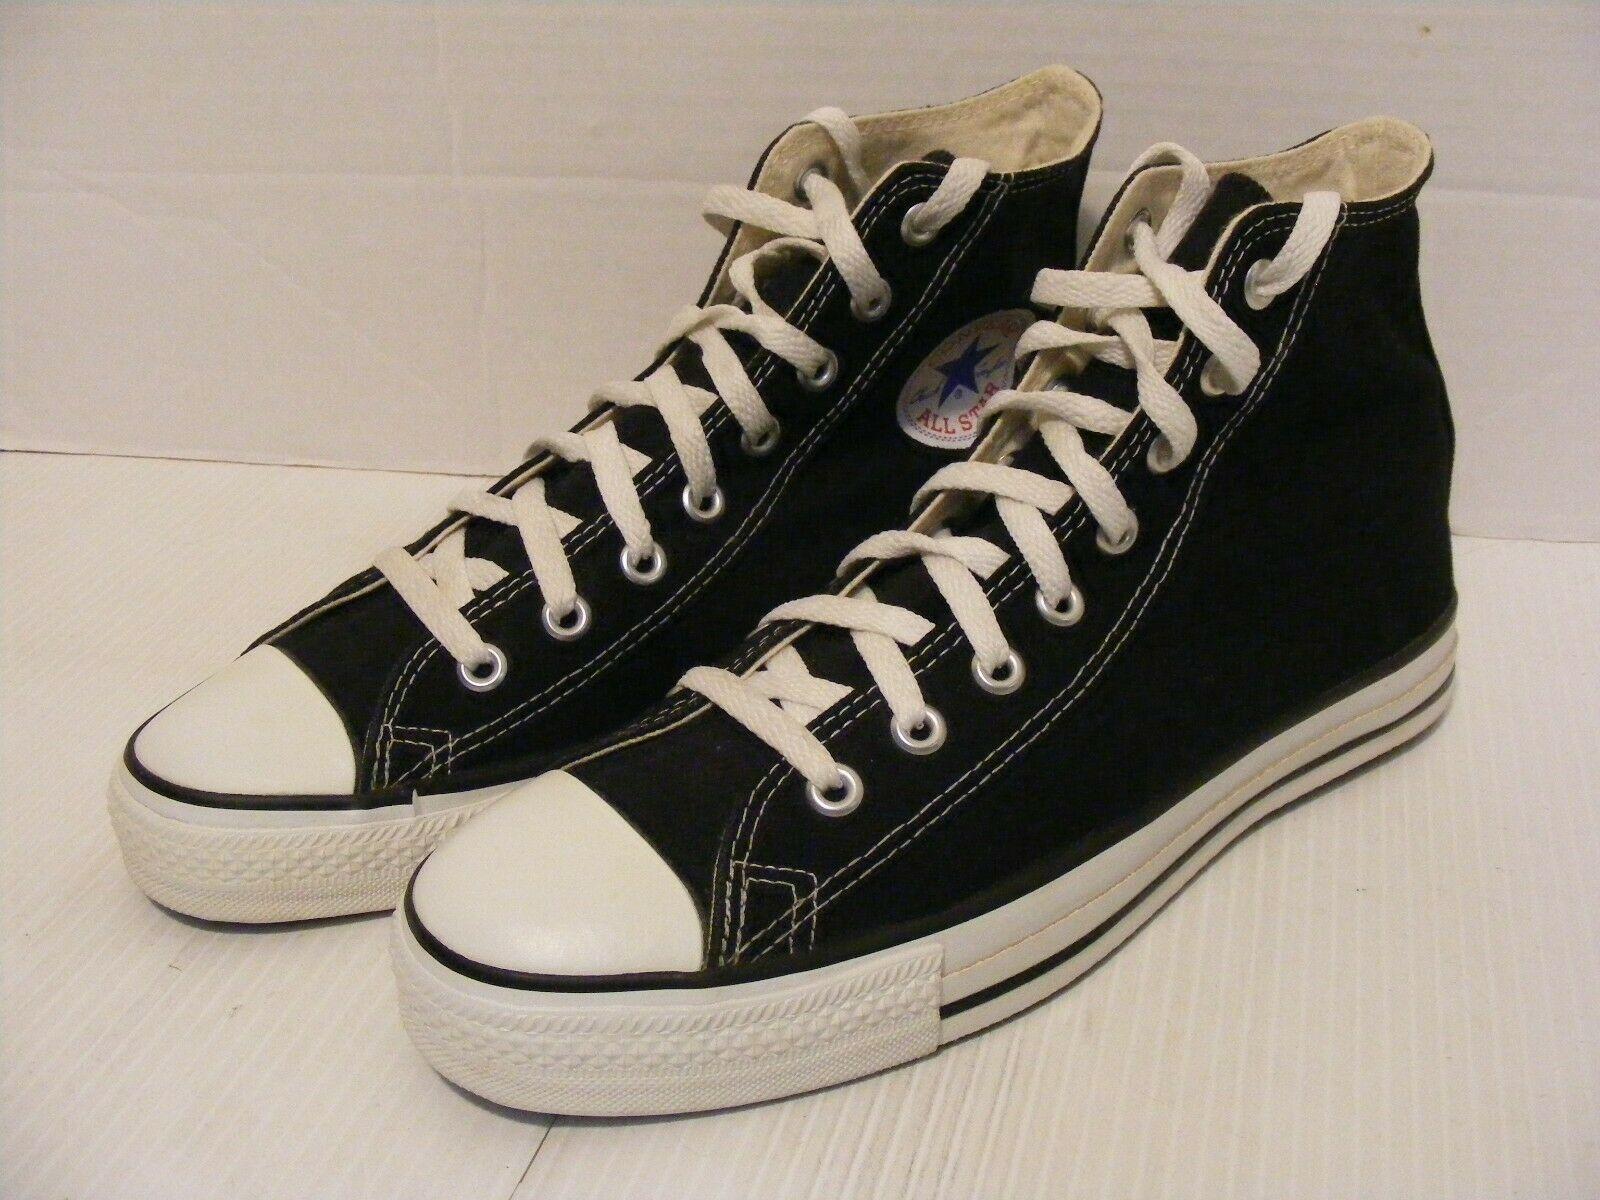 9b160c2df059 VTG Converse Chuck Taylor All Star Black High Top Canvas Shoes SZ 9 USA MADE